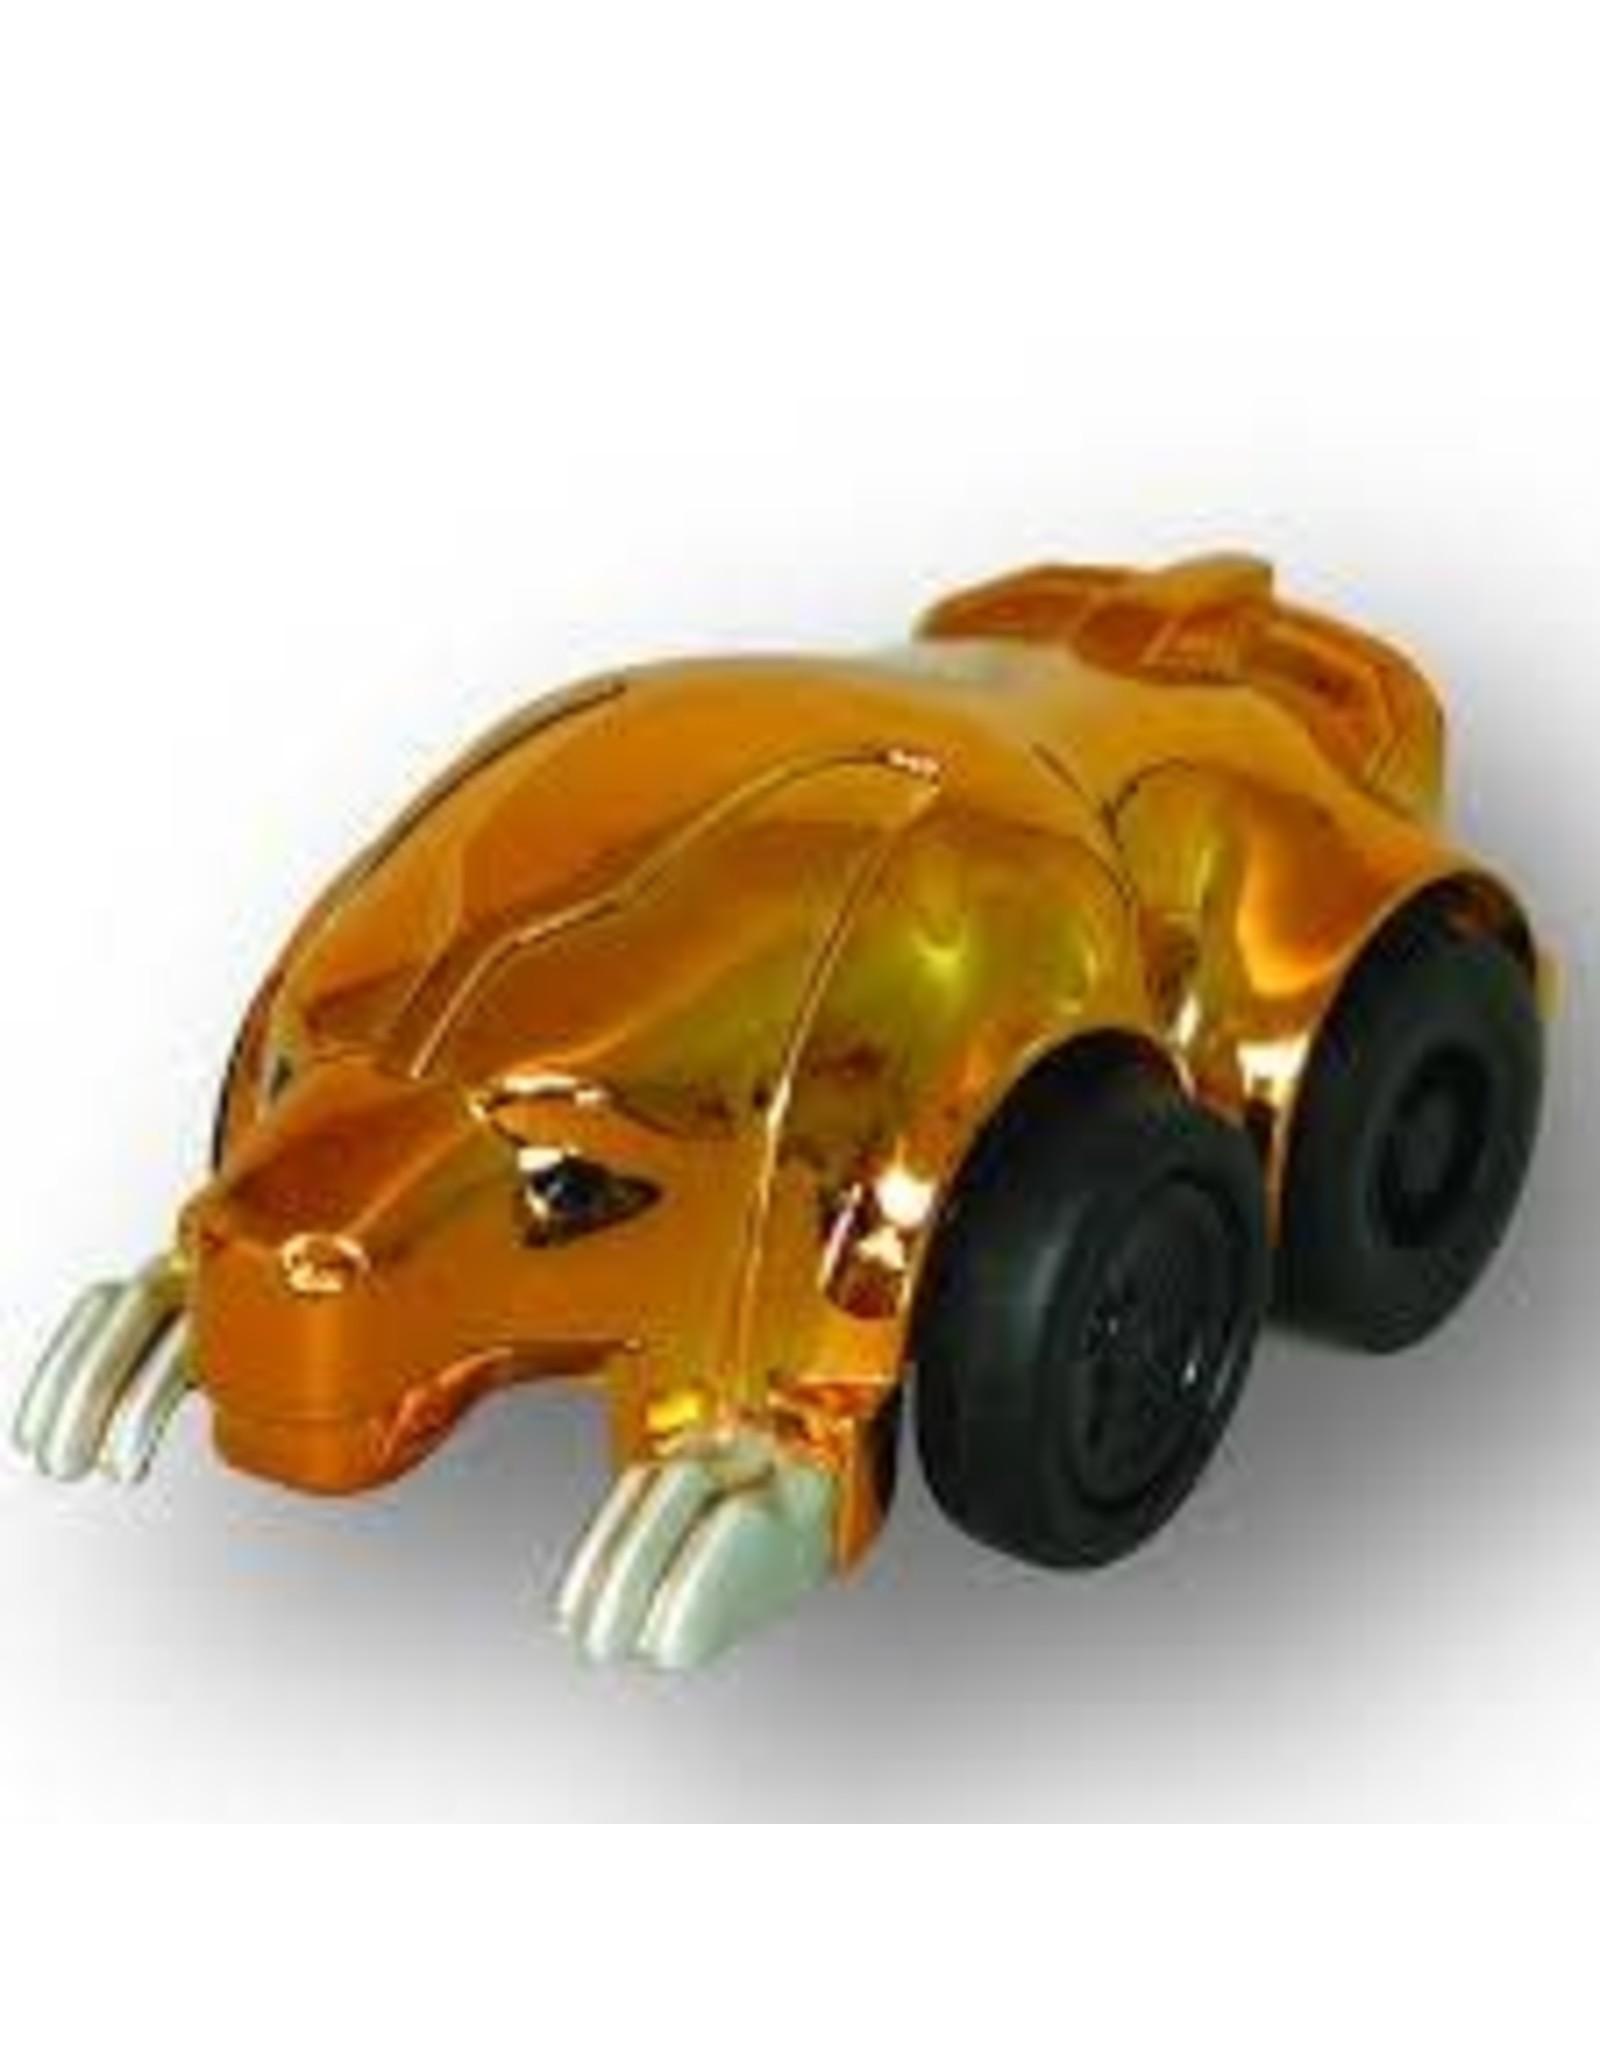 California Creations Lion, Saber 20860